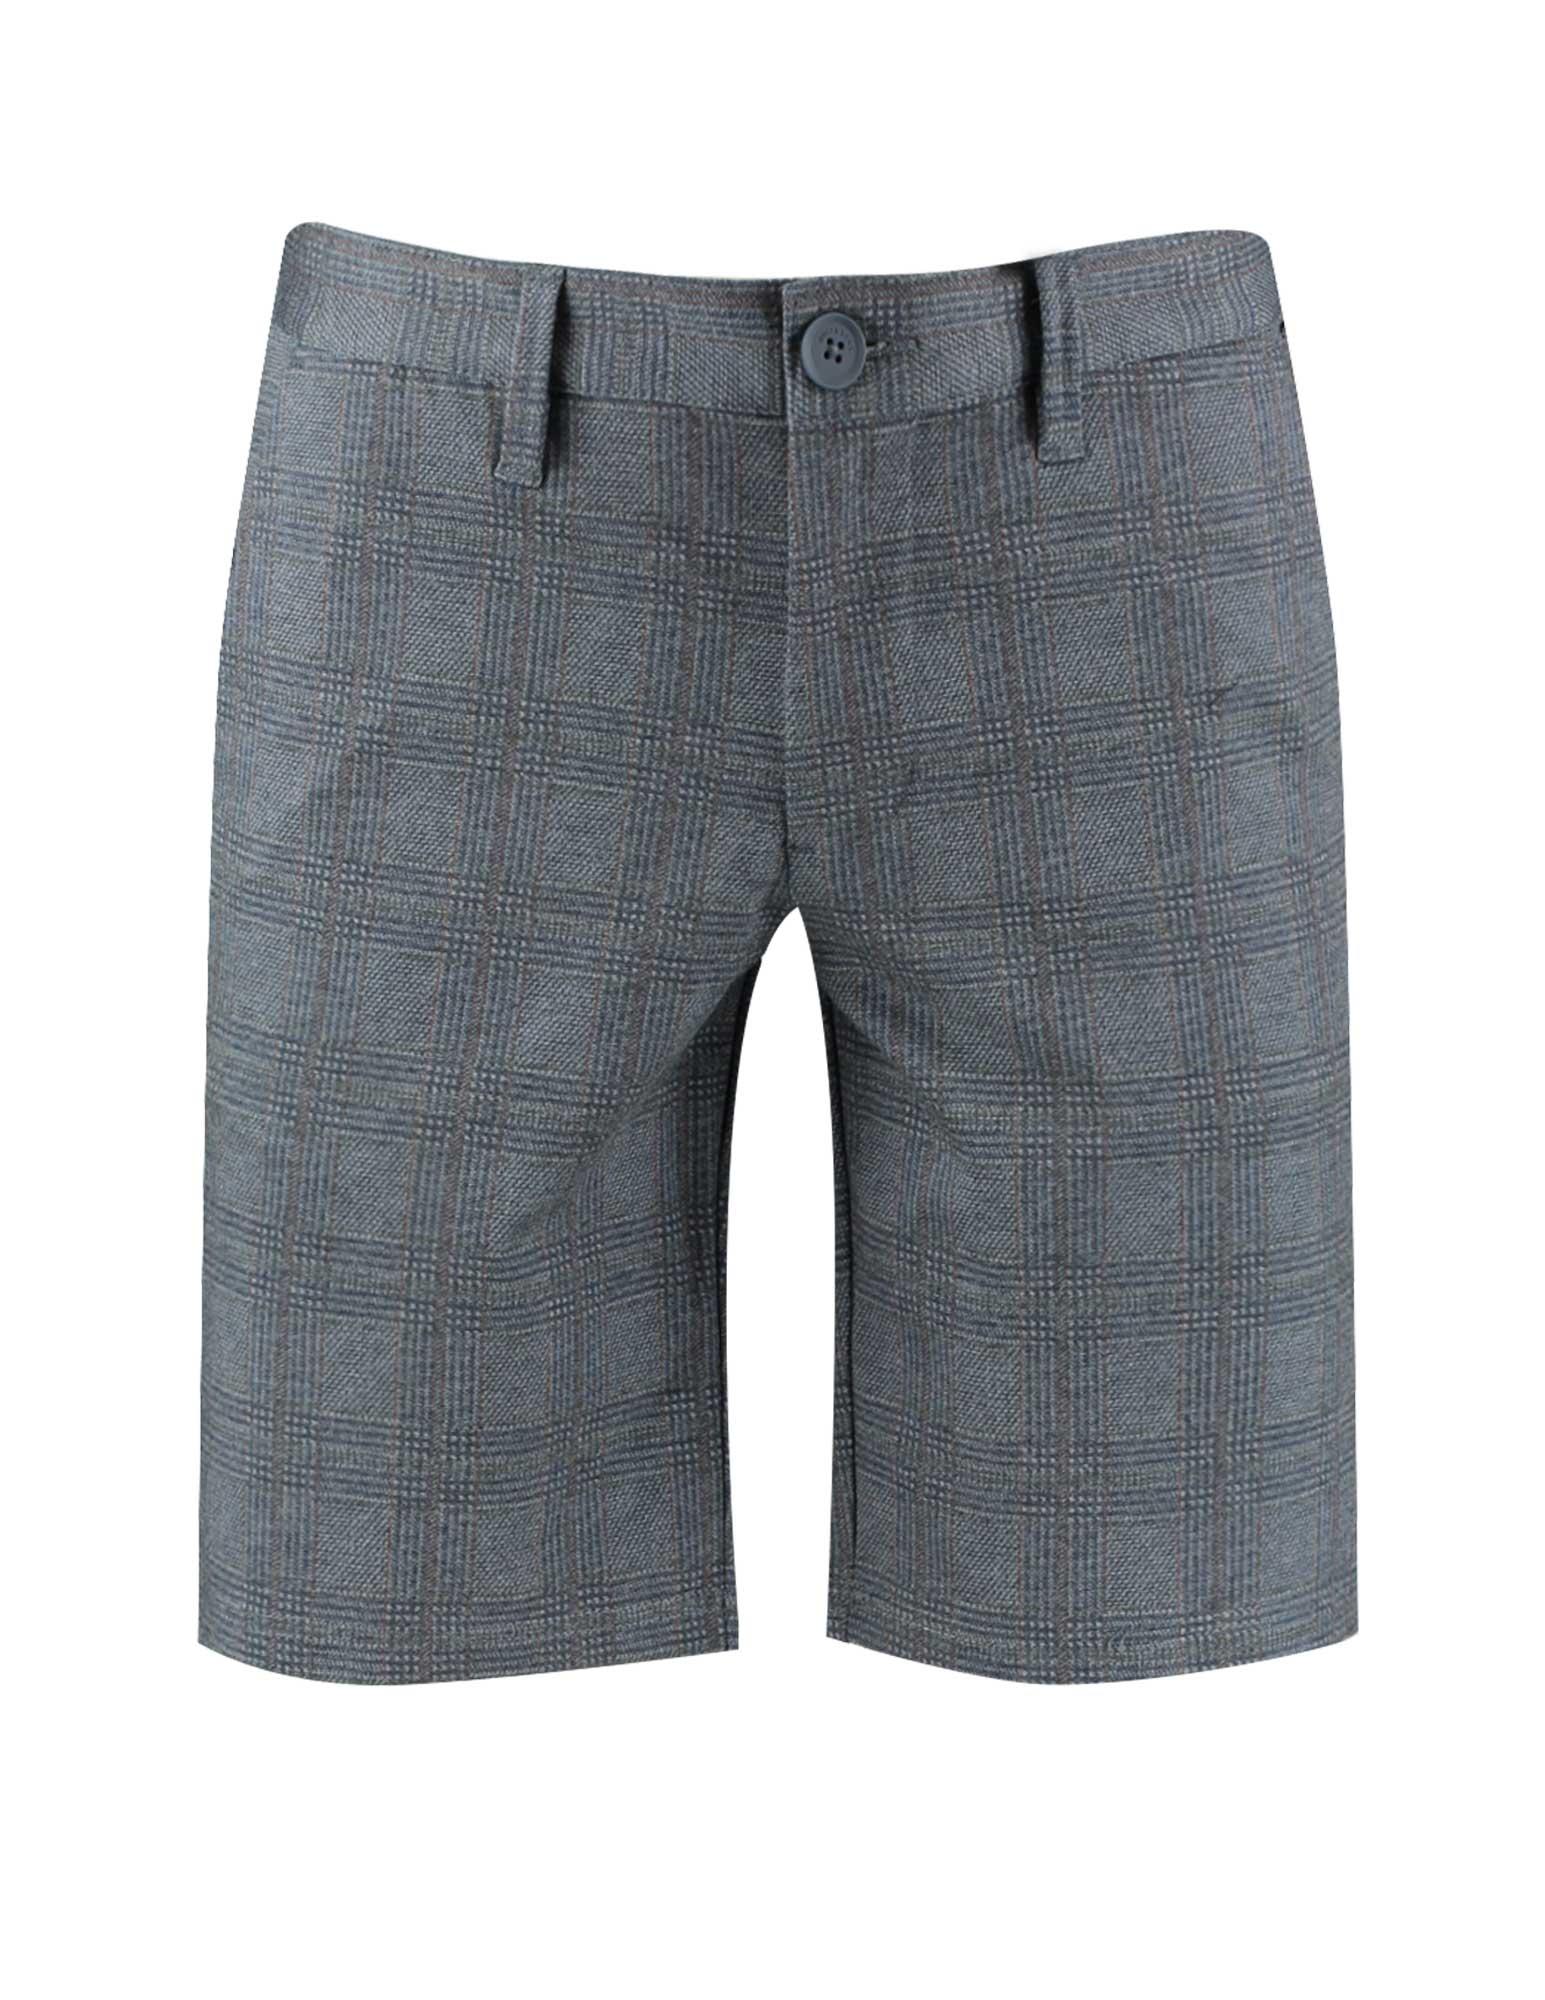 Karierte Chino Shorts